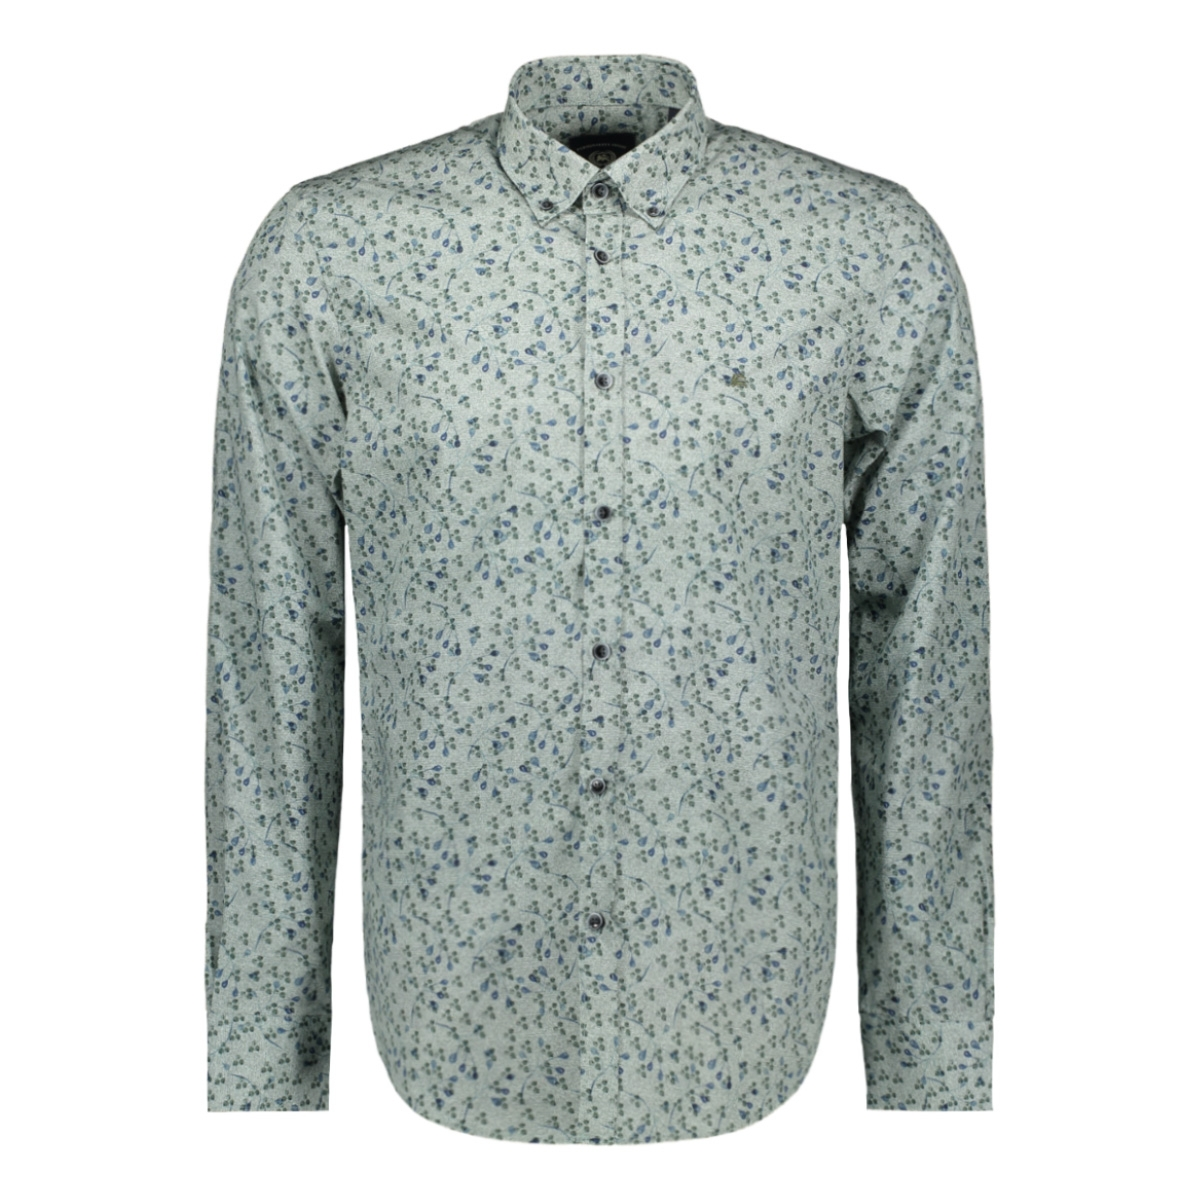 overhemd met all over print 2971121t lerros overhemd 643